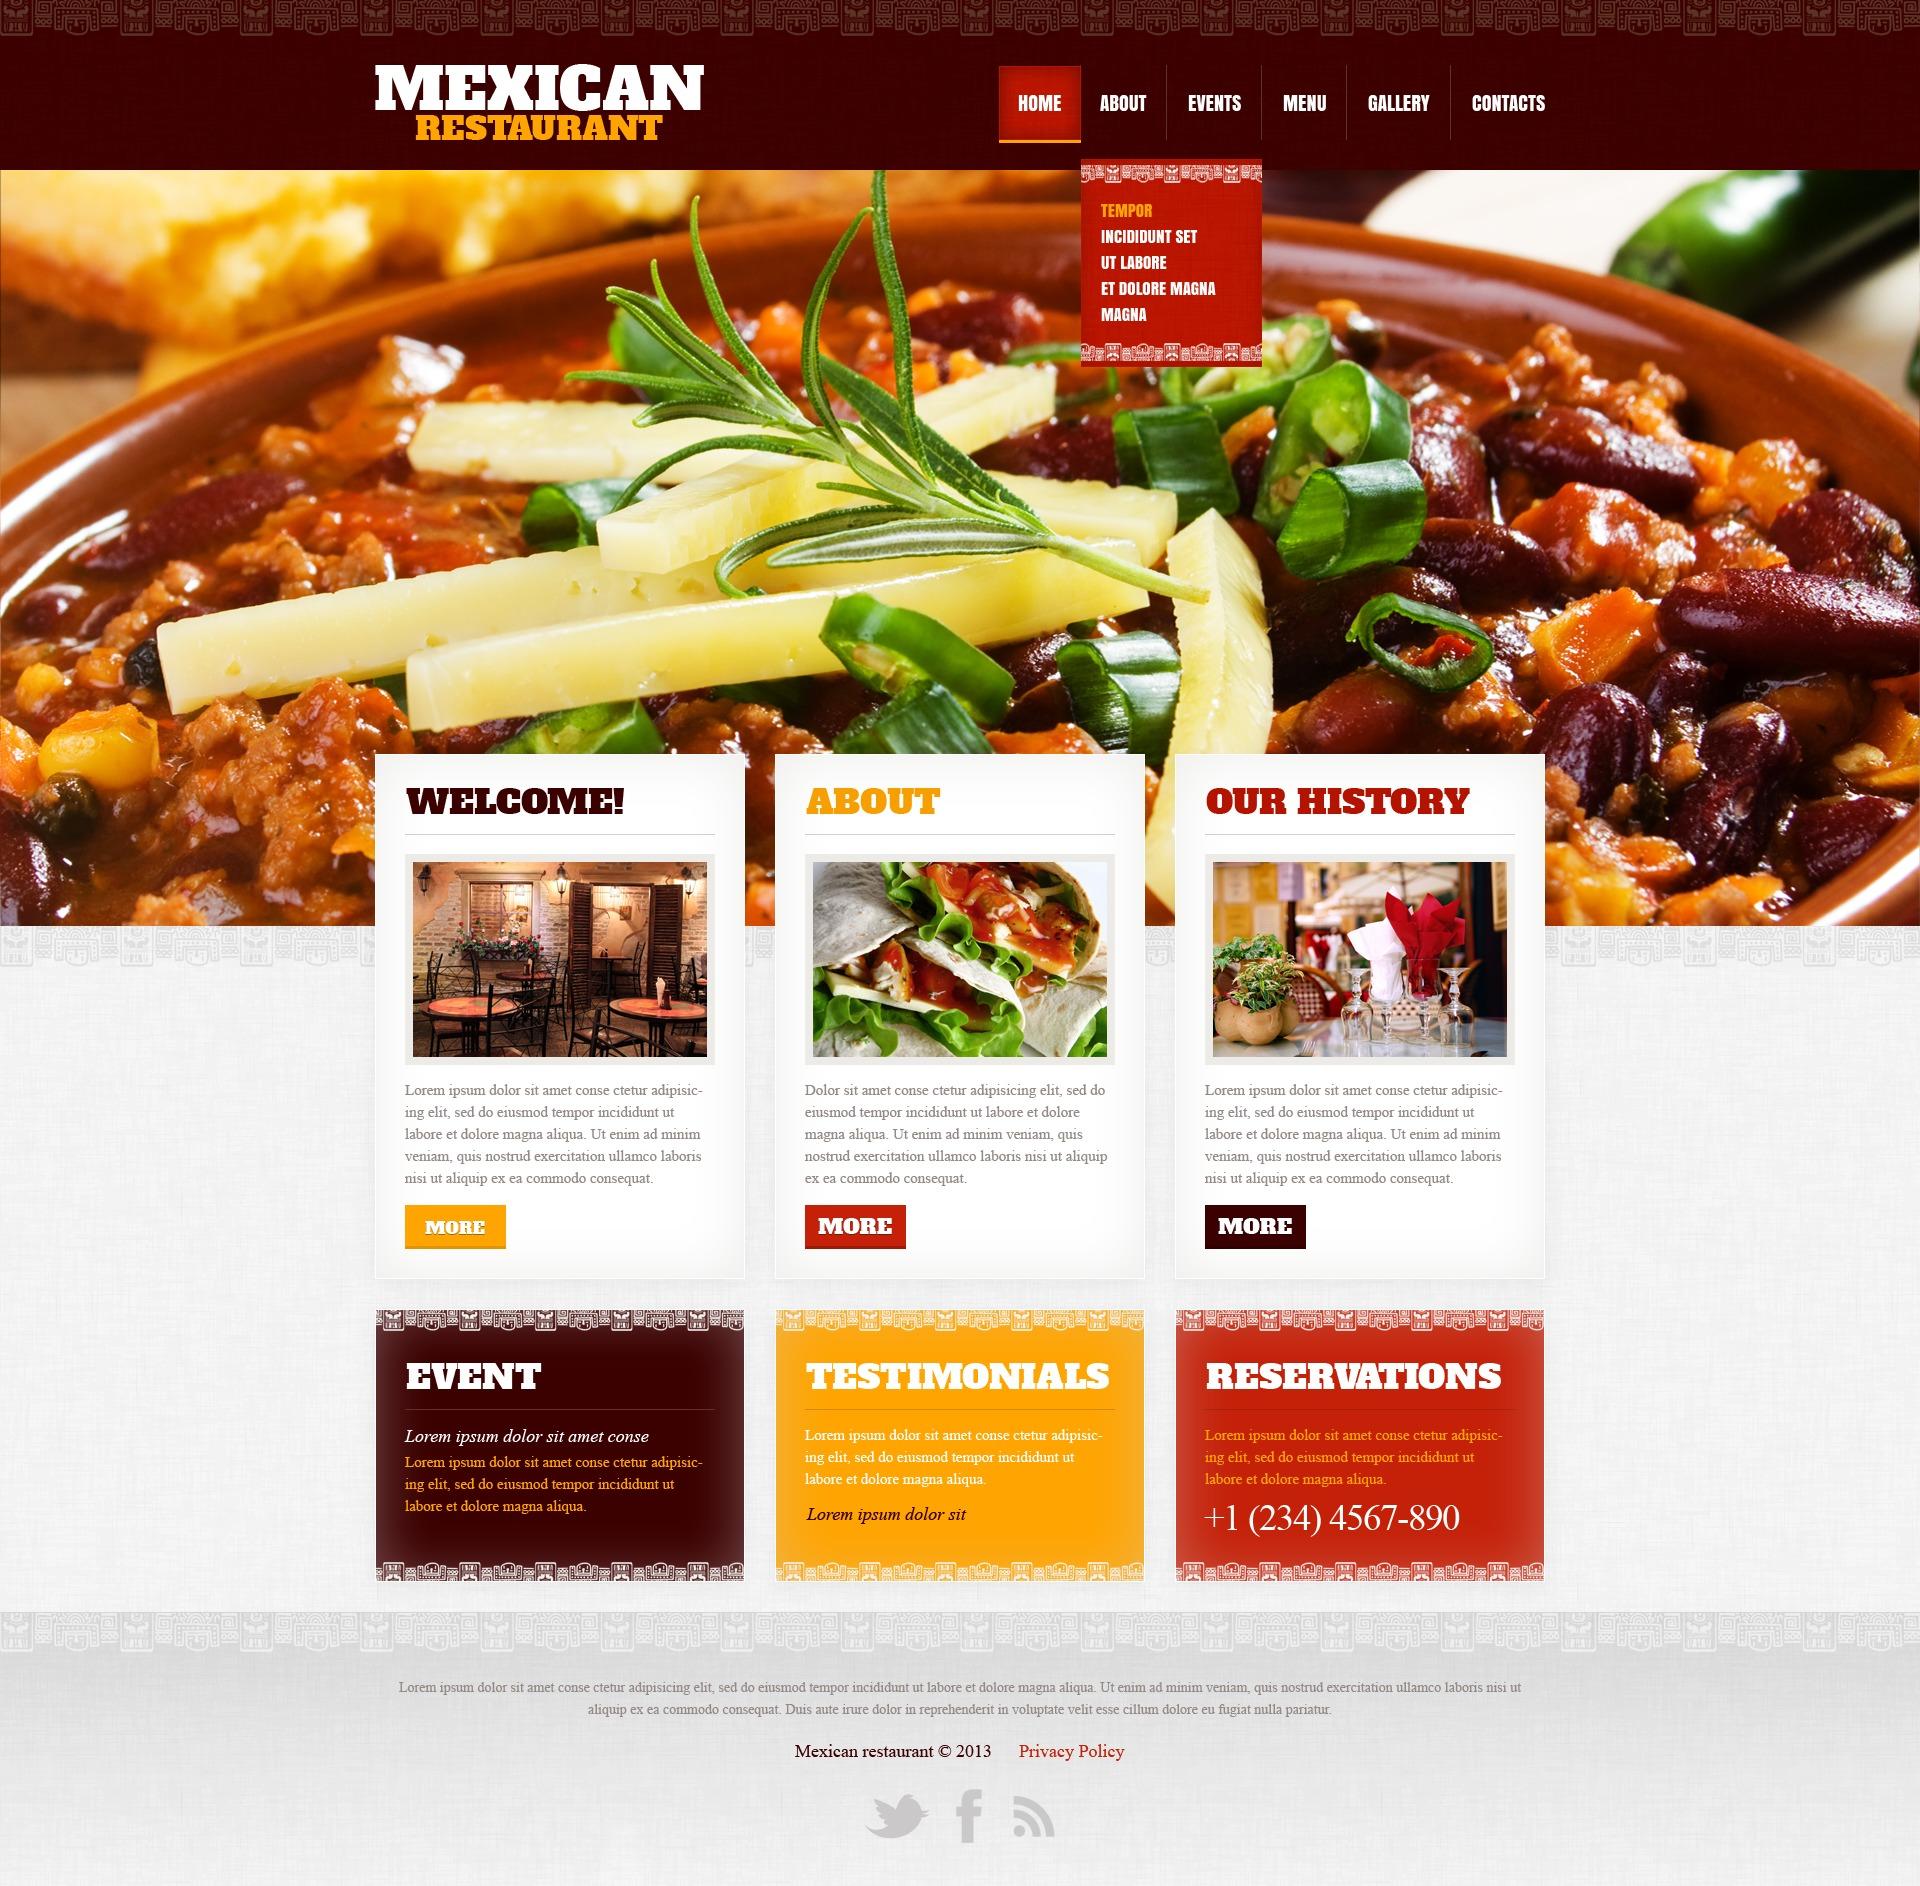 Mexican restaurant website template 42181 for Cuisine website